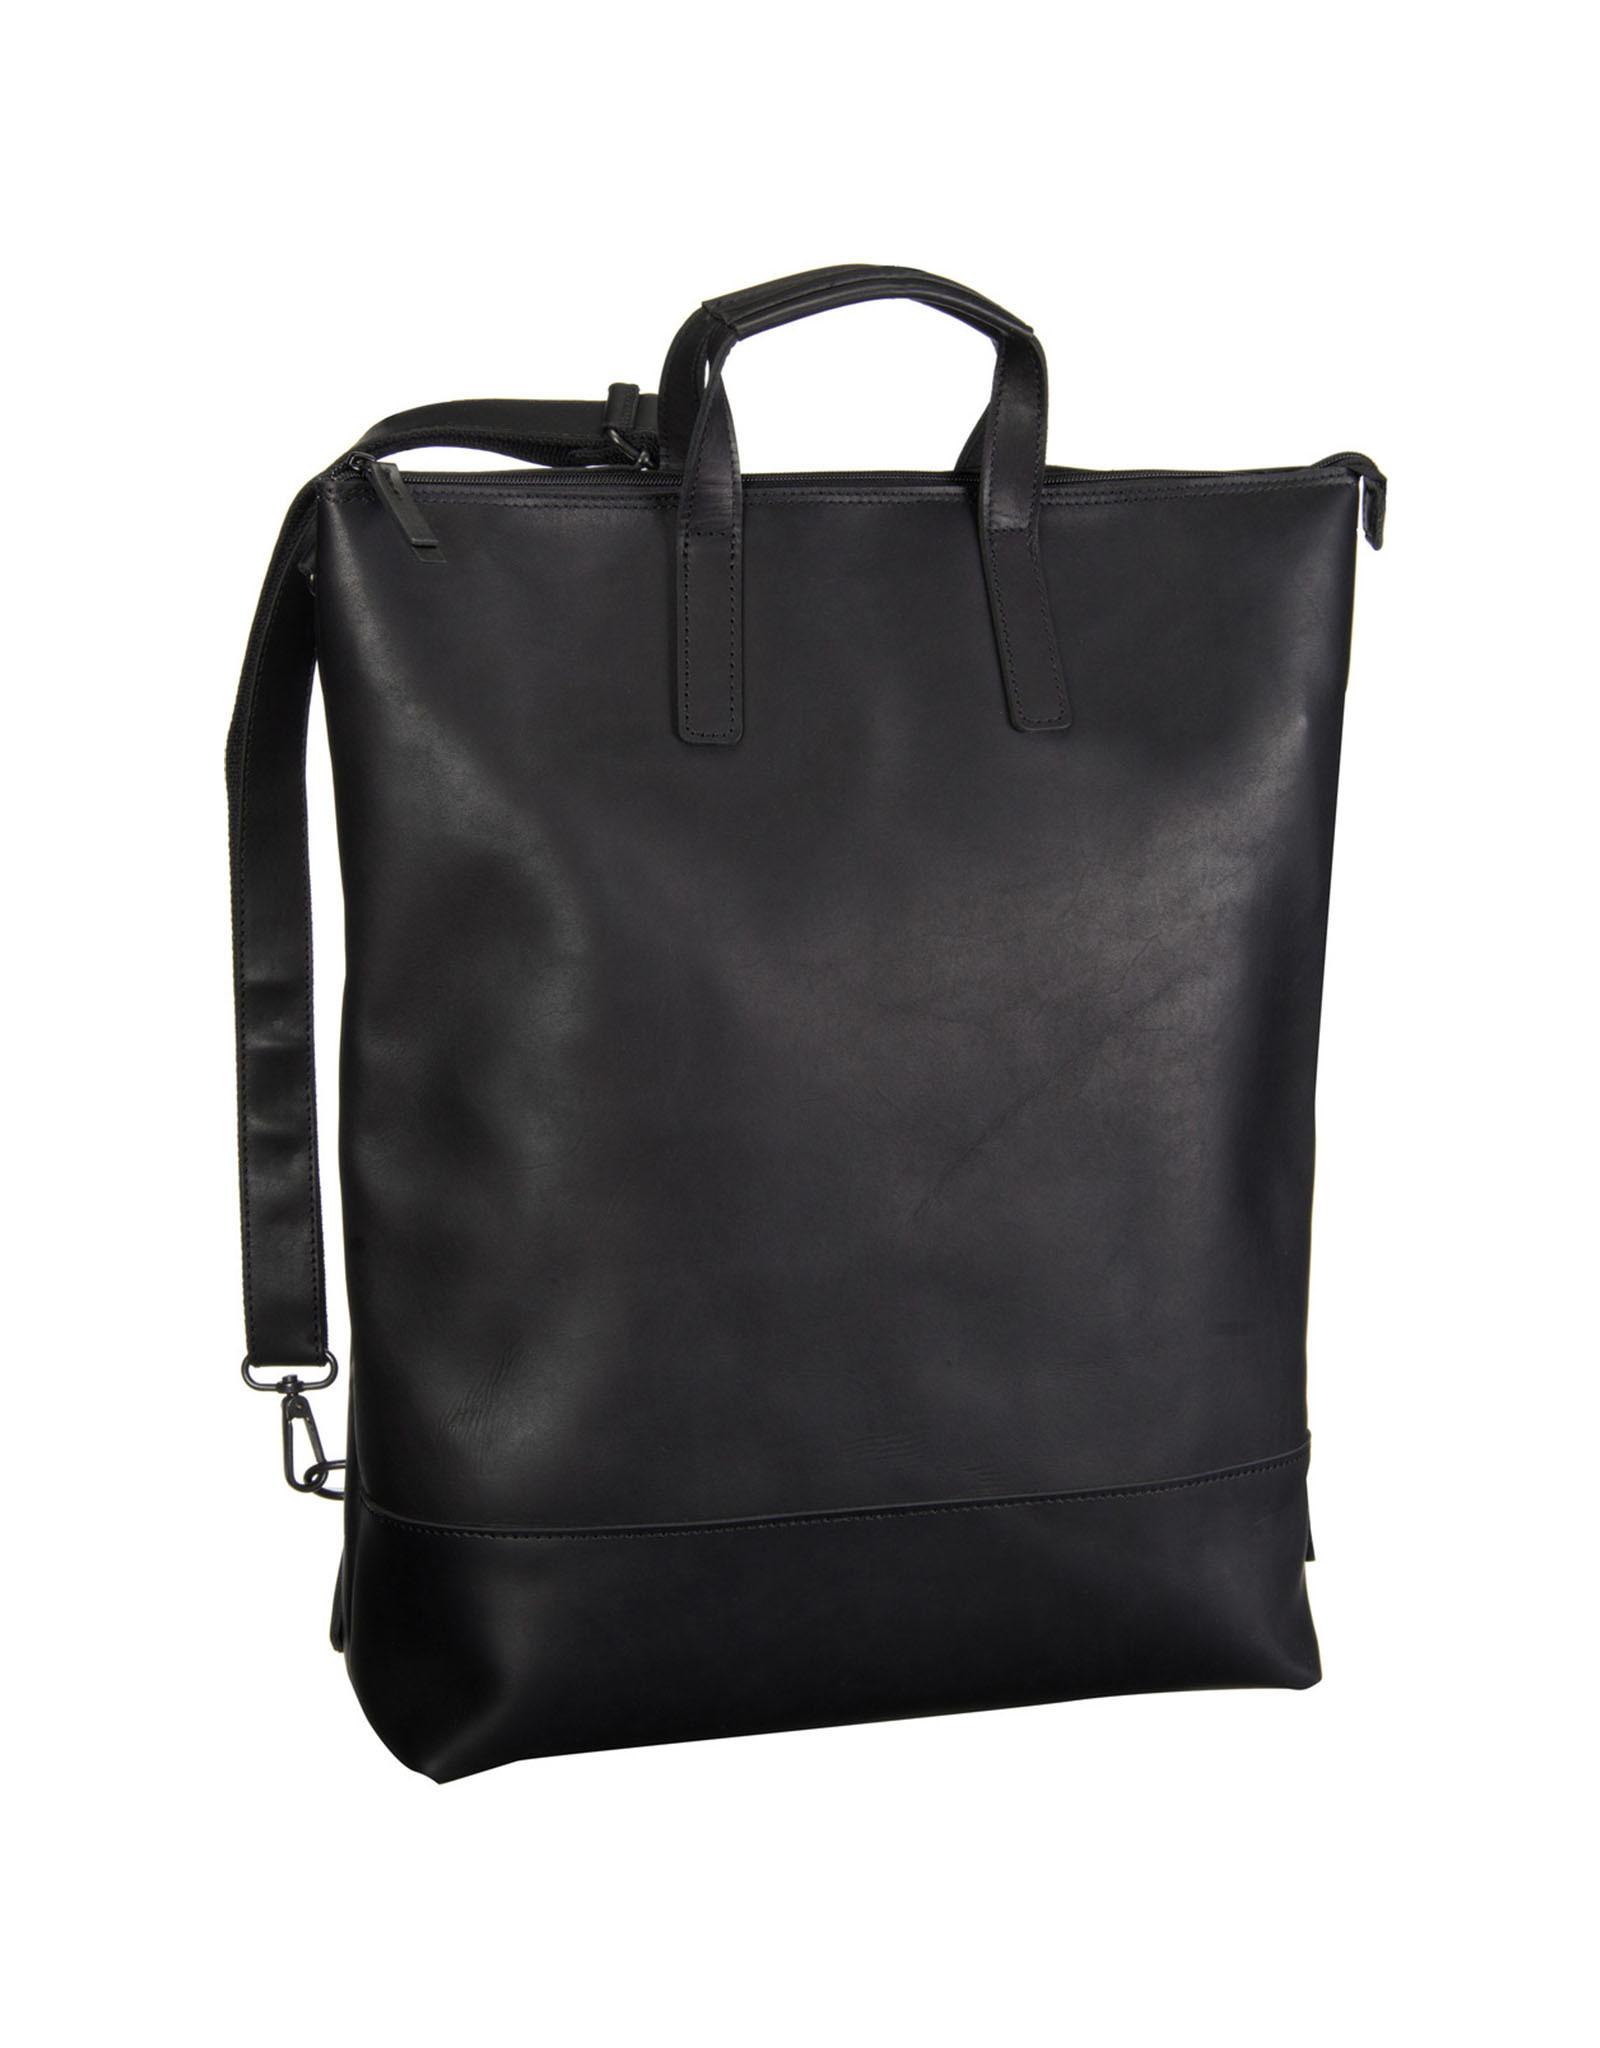 Jost Bags Futura Large X-Change Bag   Black